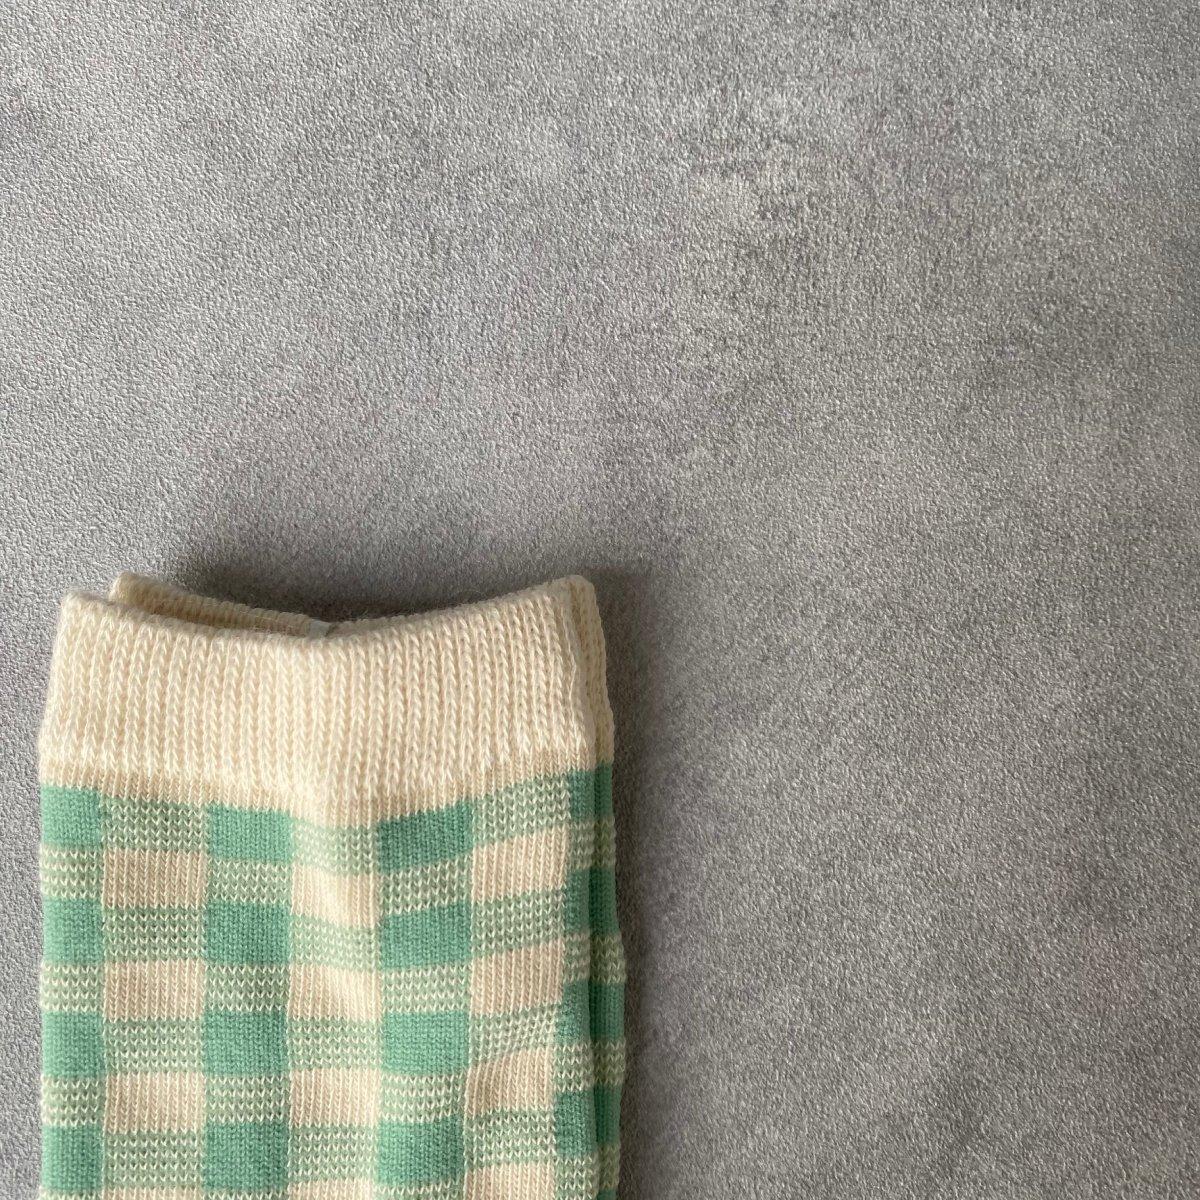 【KIDS】Natural Check Socks 詳細画像10